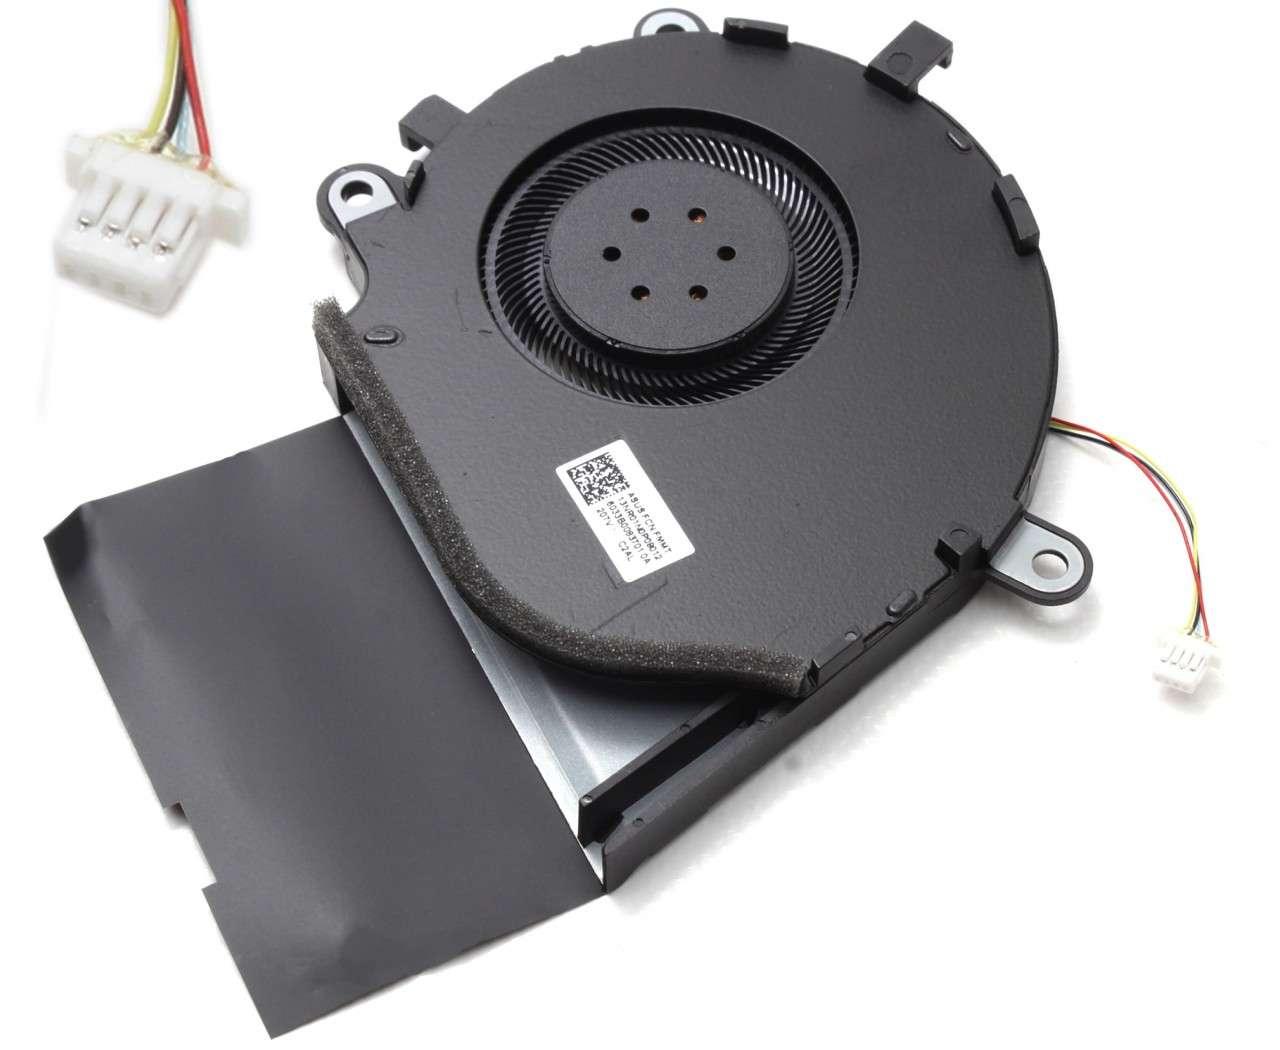 Cooler procesor CPU laptop Asus DFS5K12304363L 5V imagine powerlaptop.ro 2021